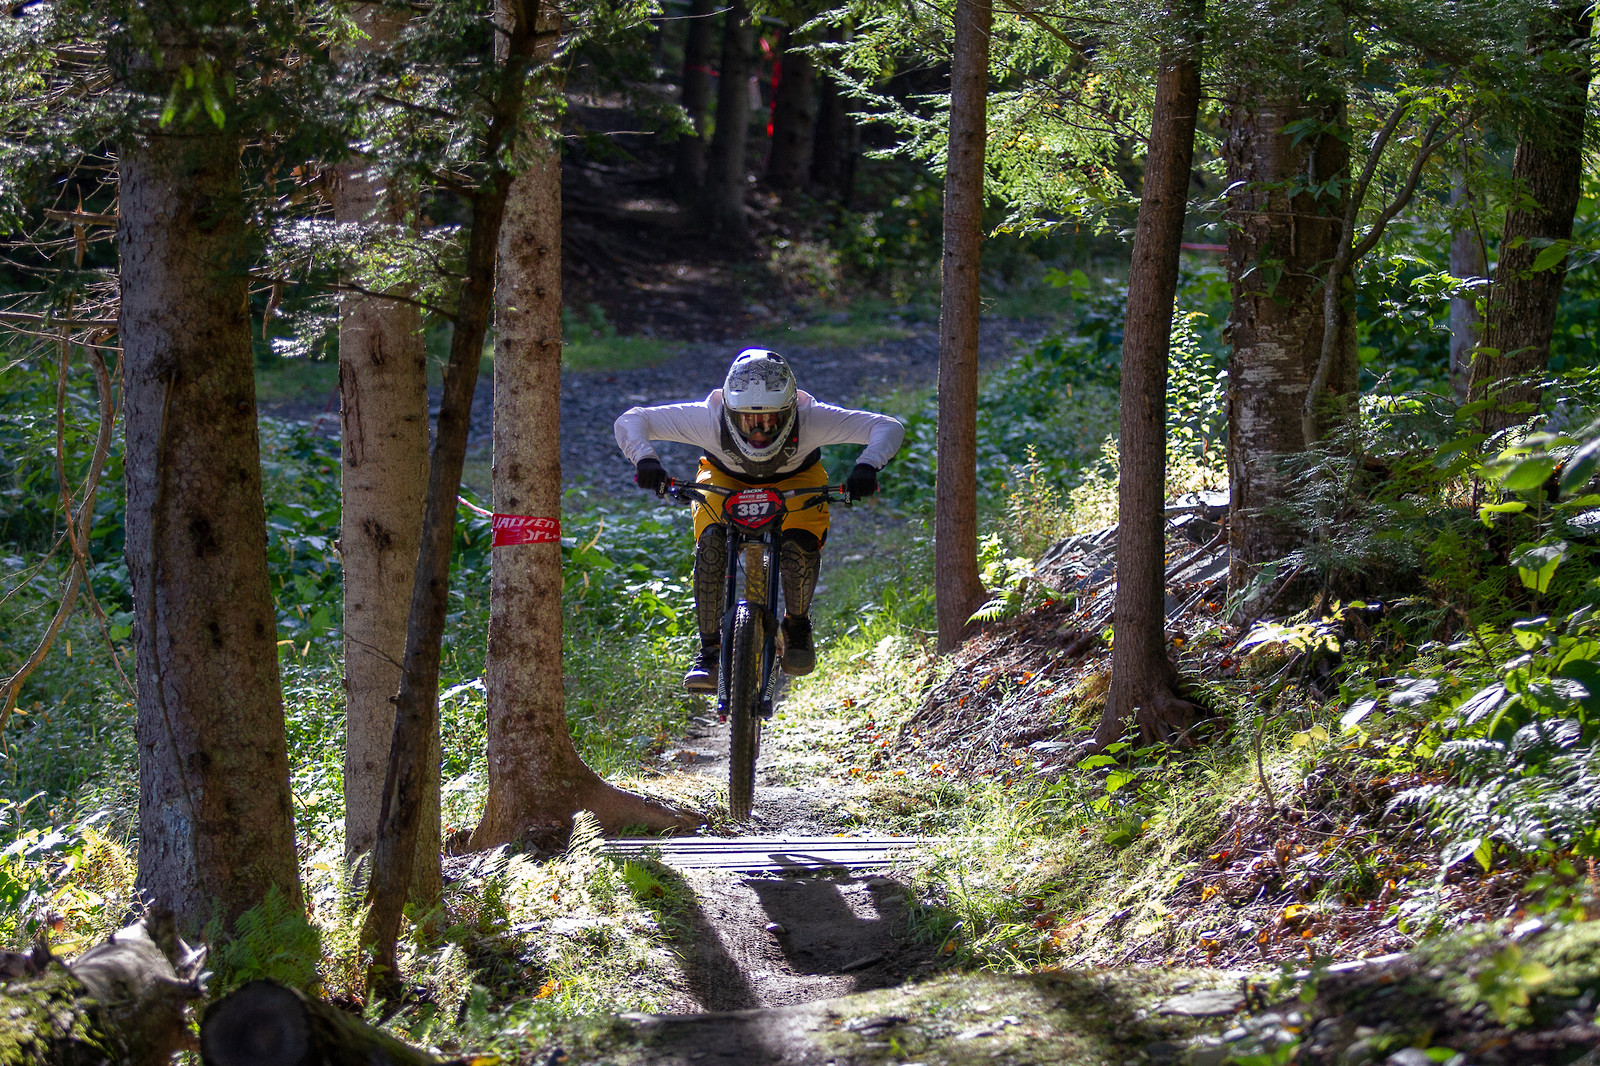 Tye McBroom - JackRice - Mountain Biking Pictures - Vital MTB